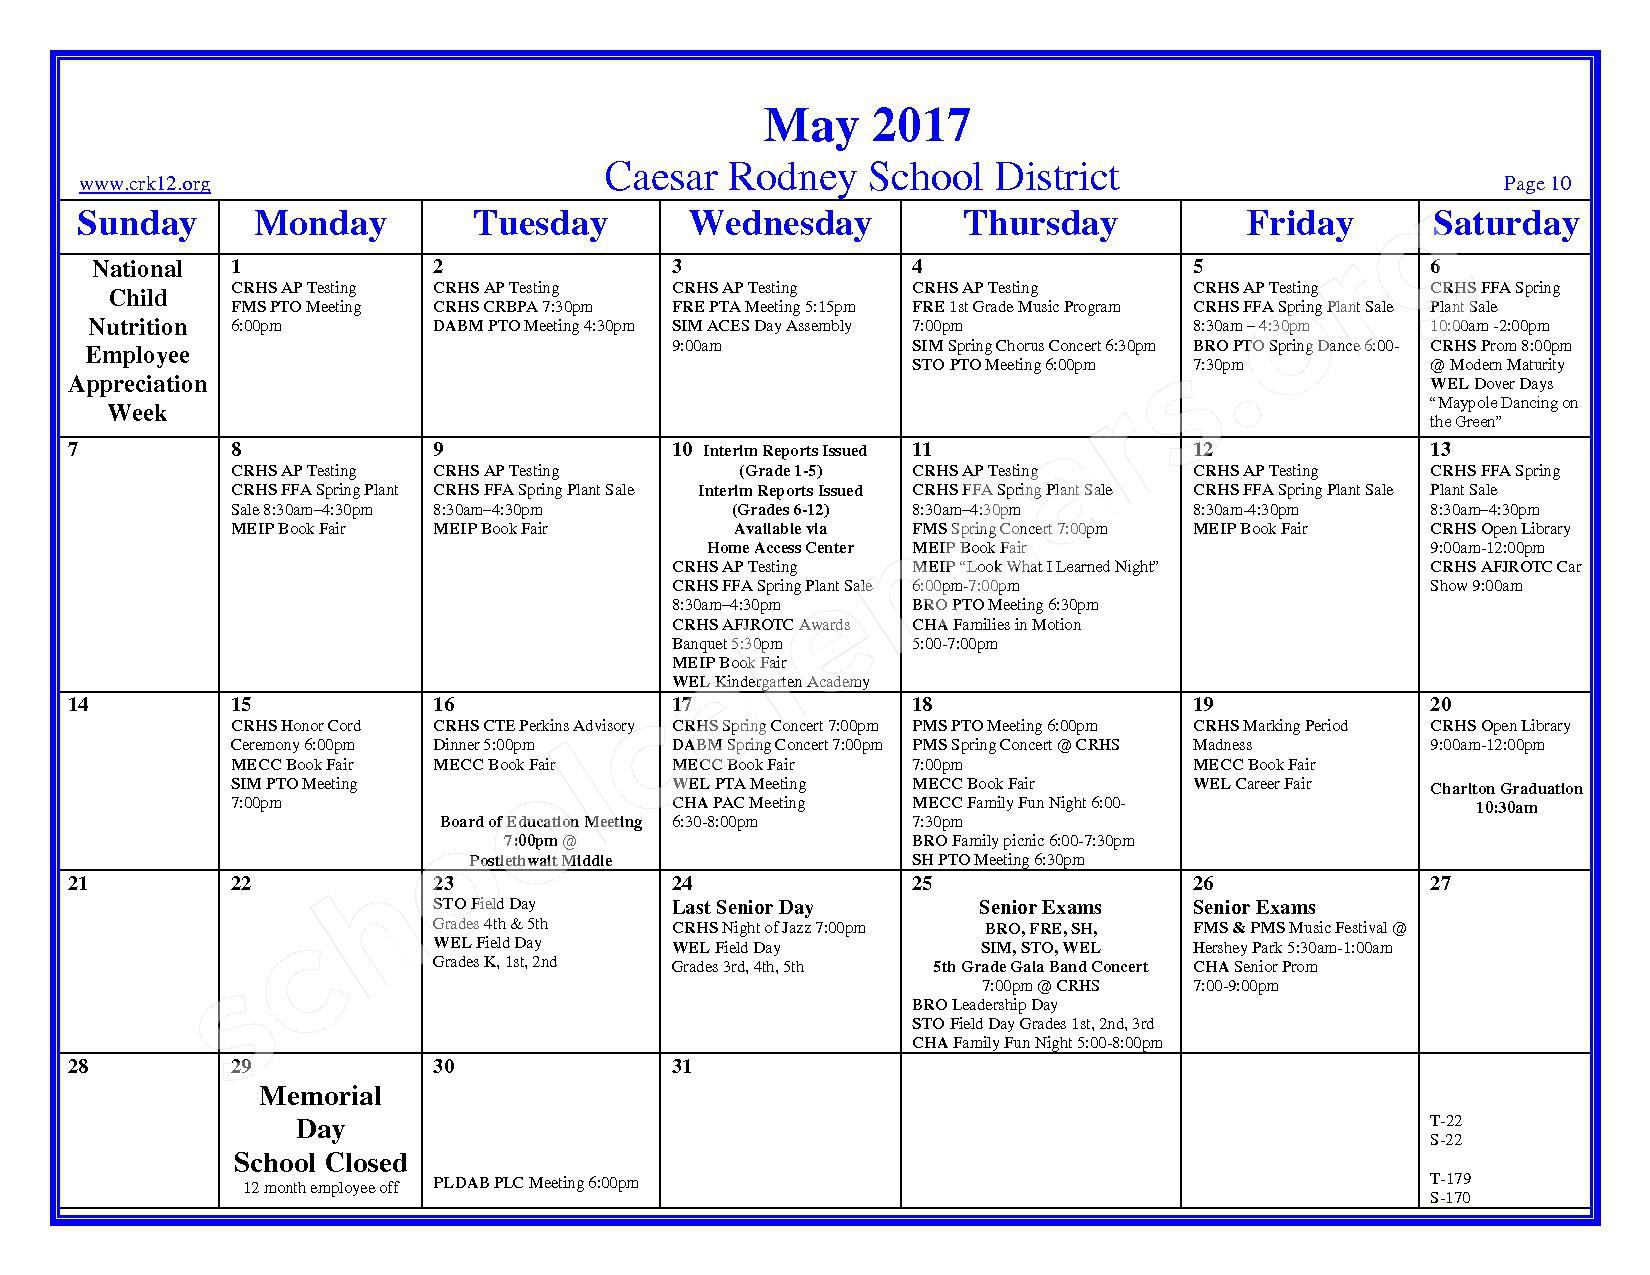 2016 - 2017 School Calendar – Brown (W. Reily) Elementary School – page 10